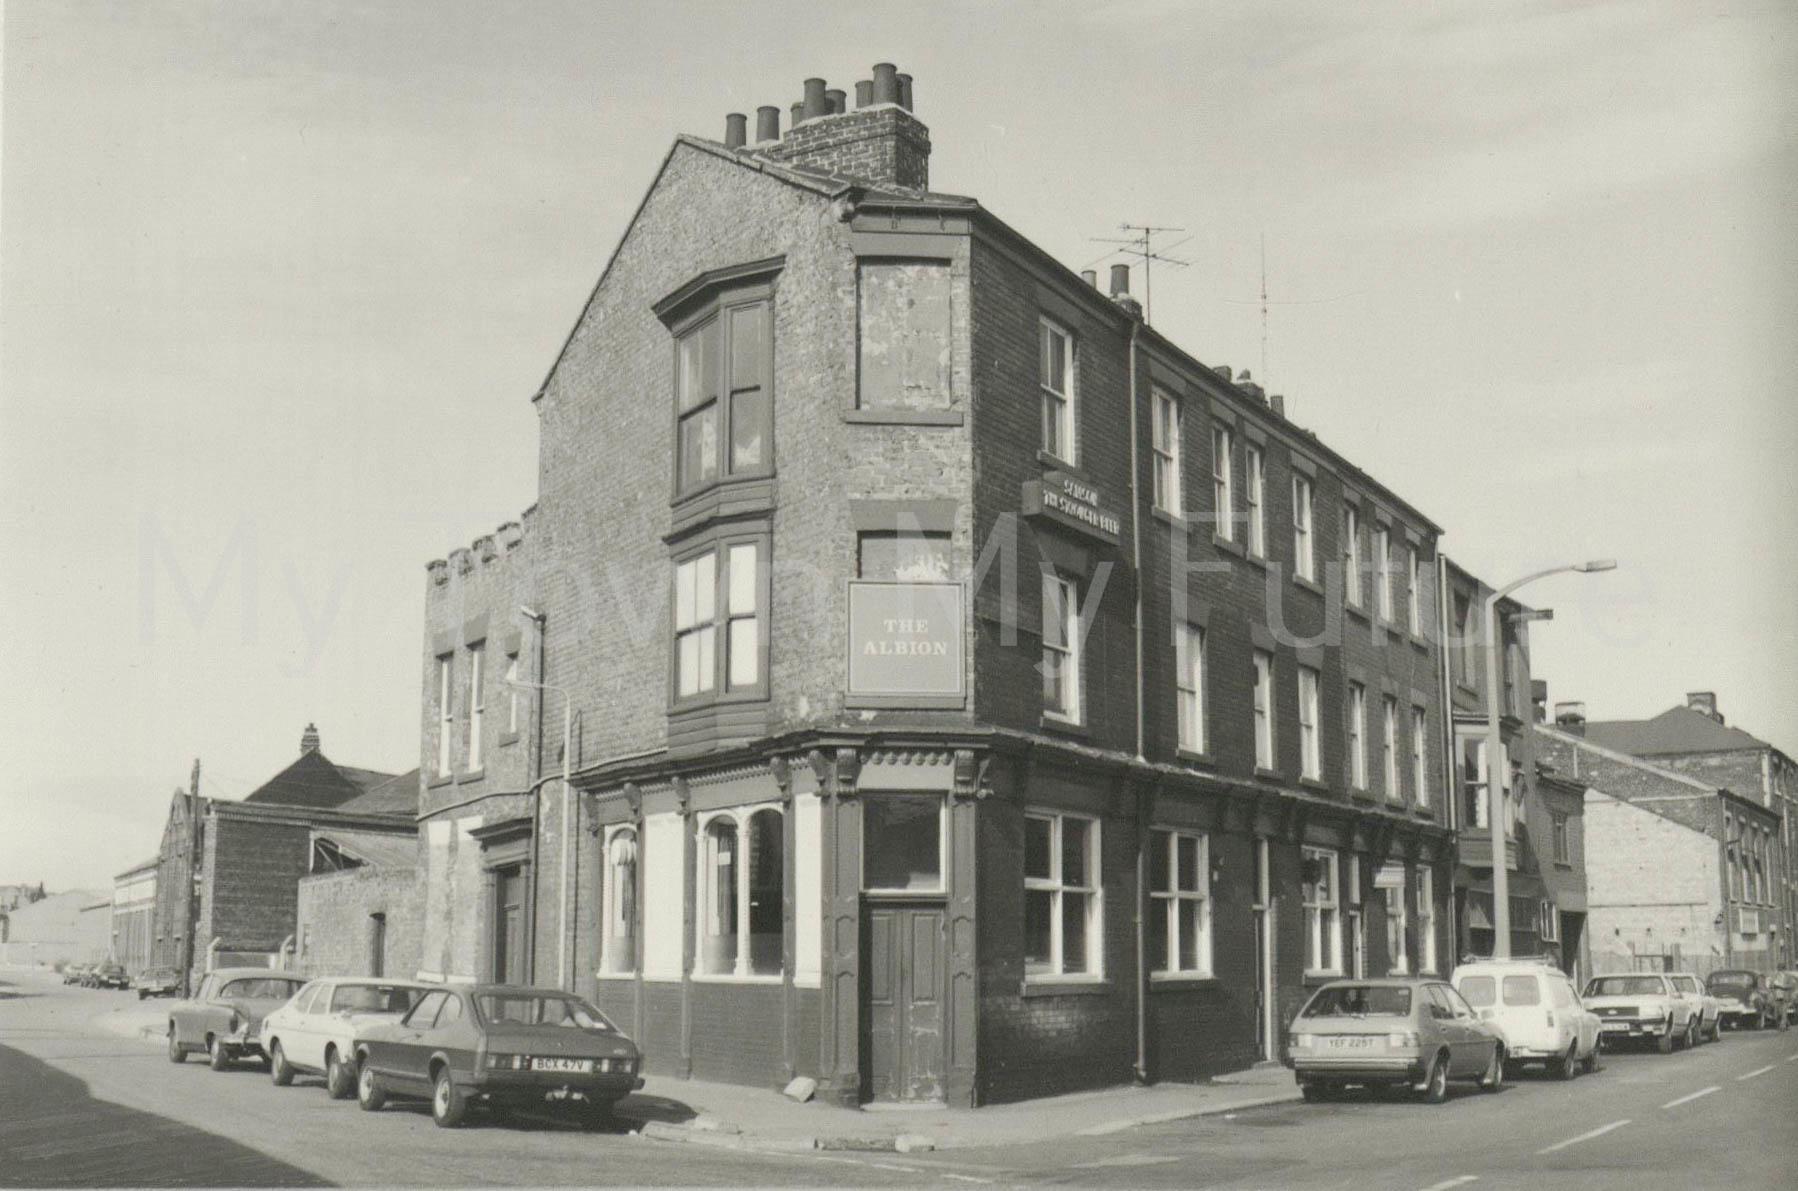 The Albion,Dock Street